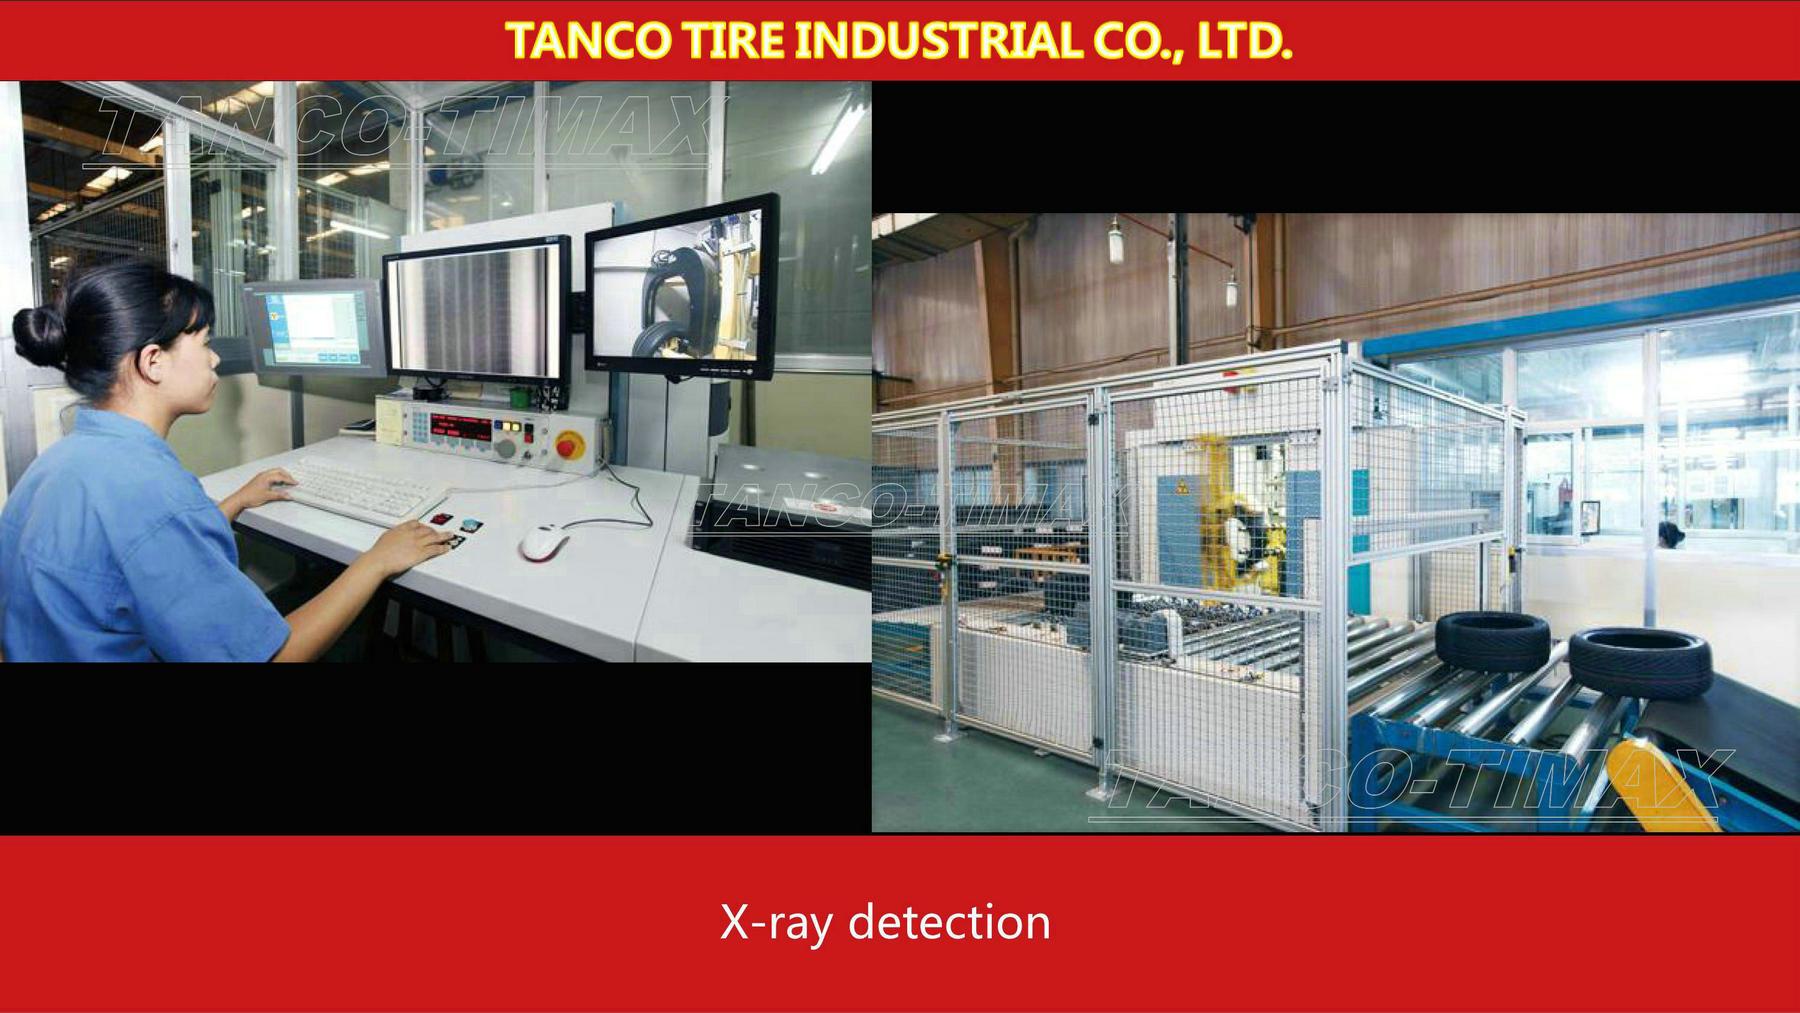 12. X-ray detection